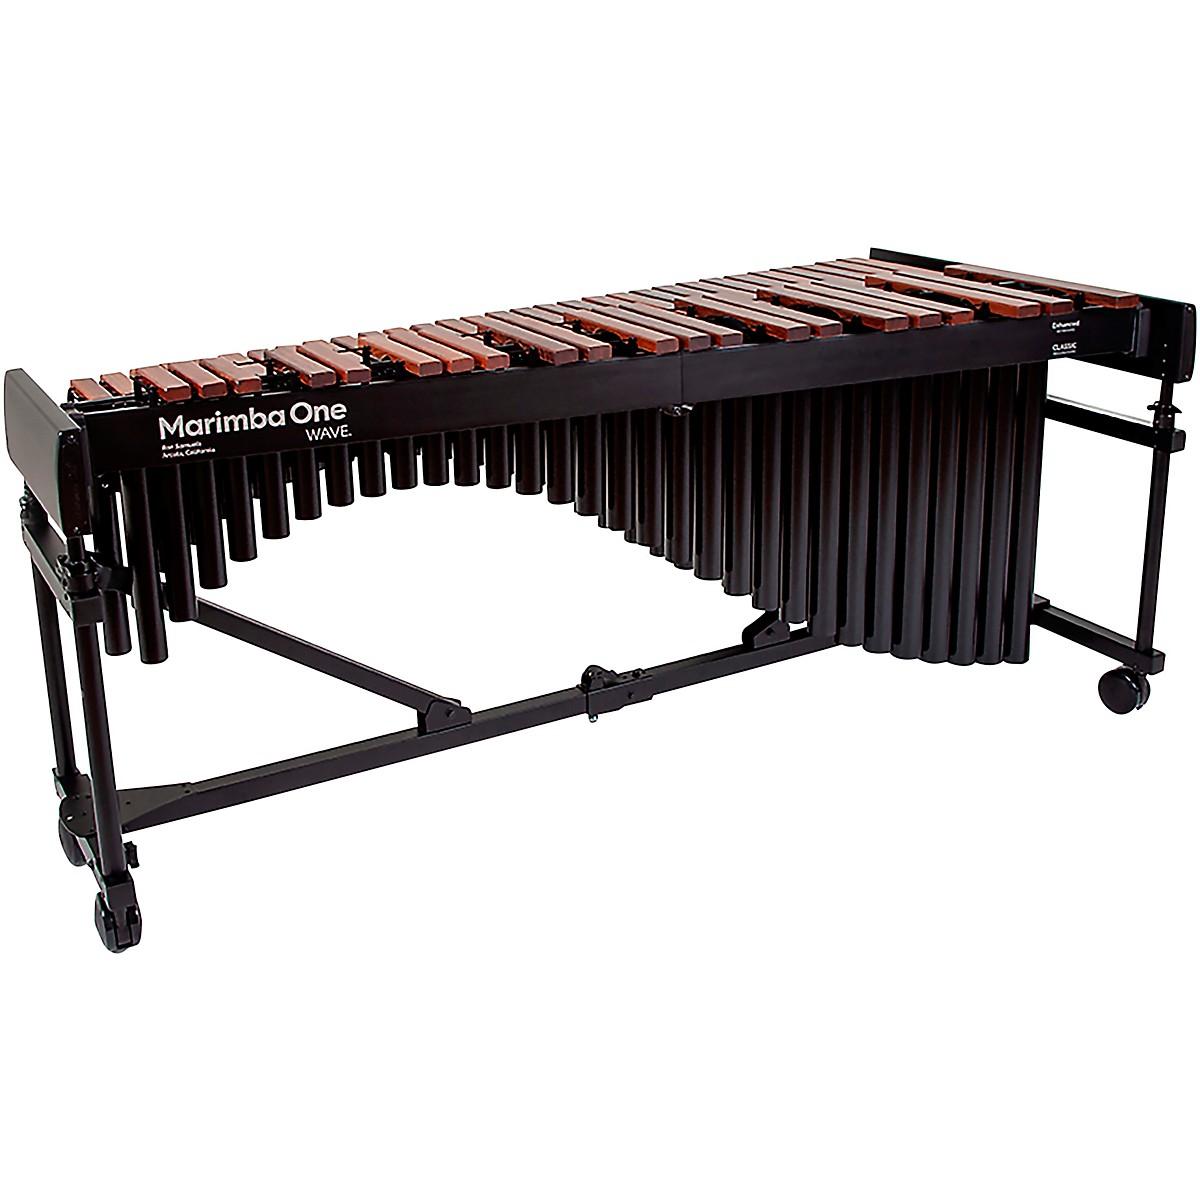 Marimba One Wave #9622 A440 4.3 Octave Marimba with Enhanced Keyboard and Classic Resonators 4